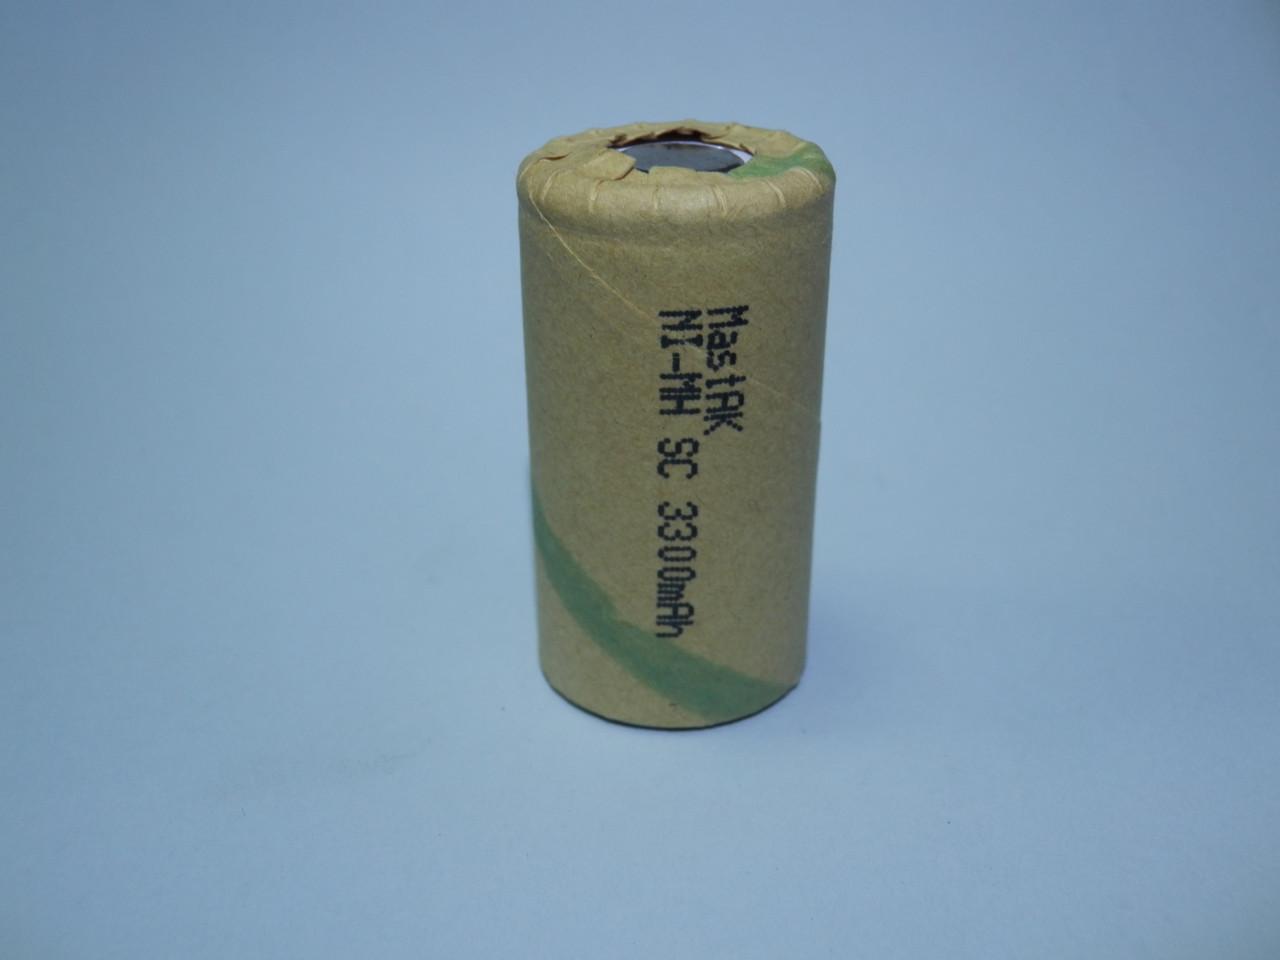 Аккумулятор технический MastAK  Sab-c 1,2v 3300mAh (Ni-Mh)